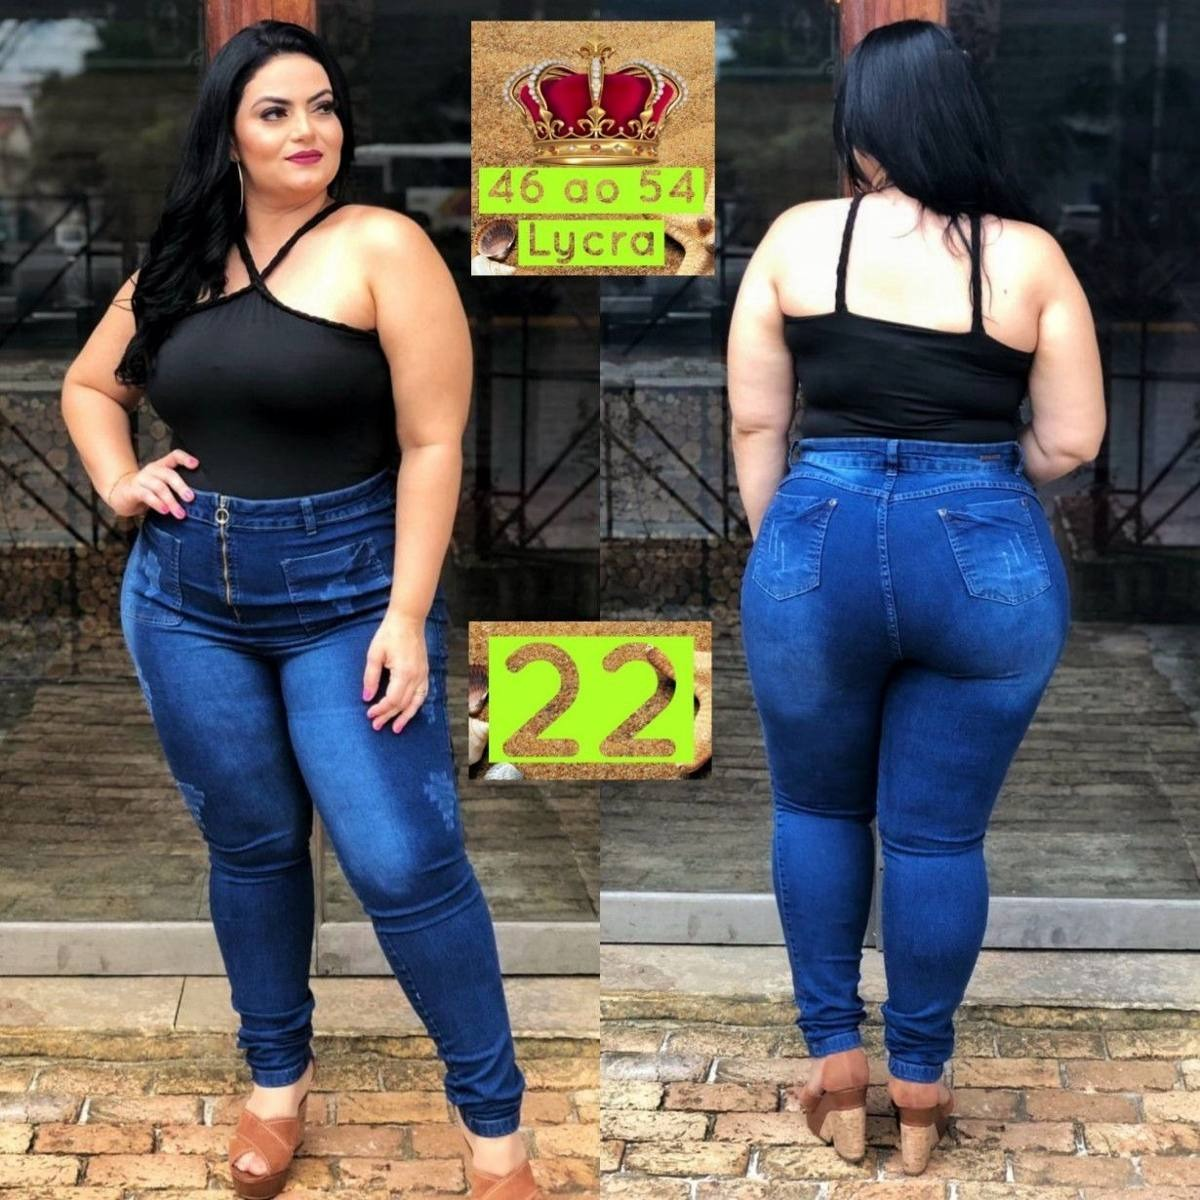 675d99479 calça jeans plus size cintura alta lycra moda gg ref. 7. Carregando zoom.